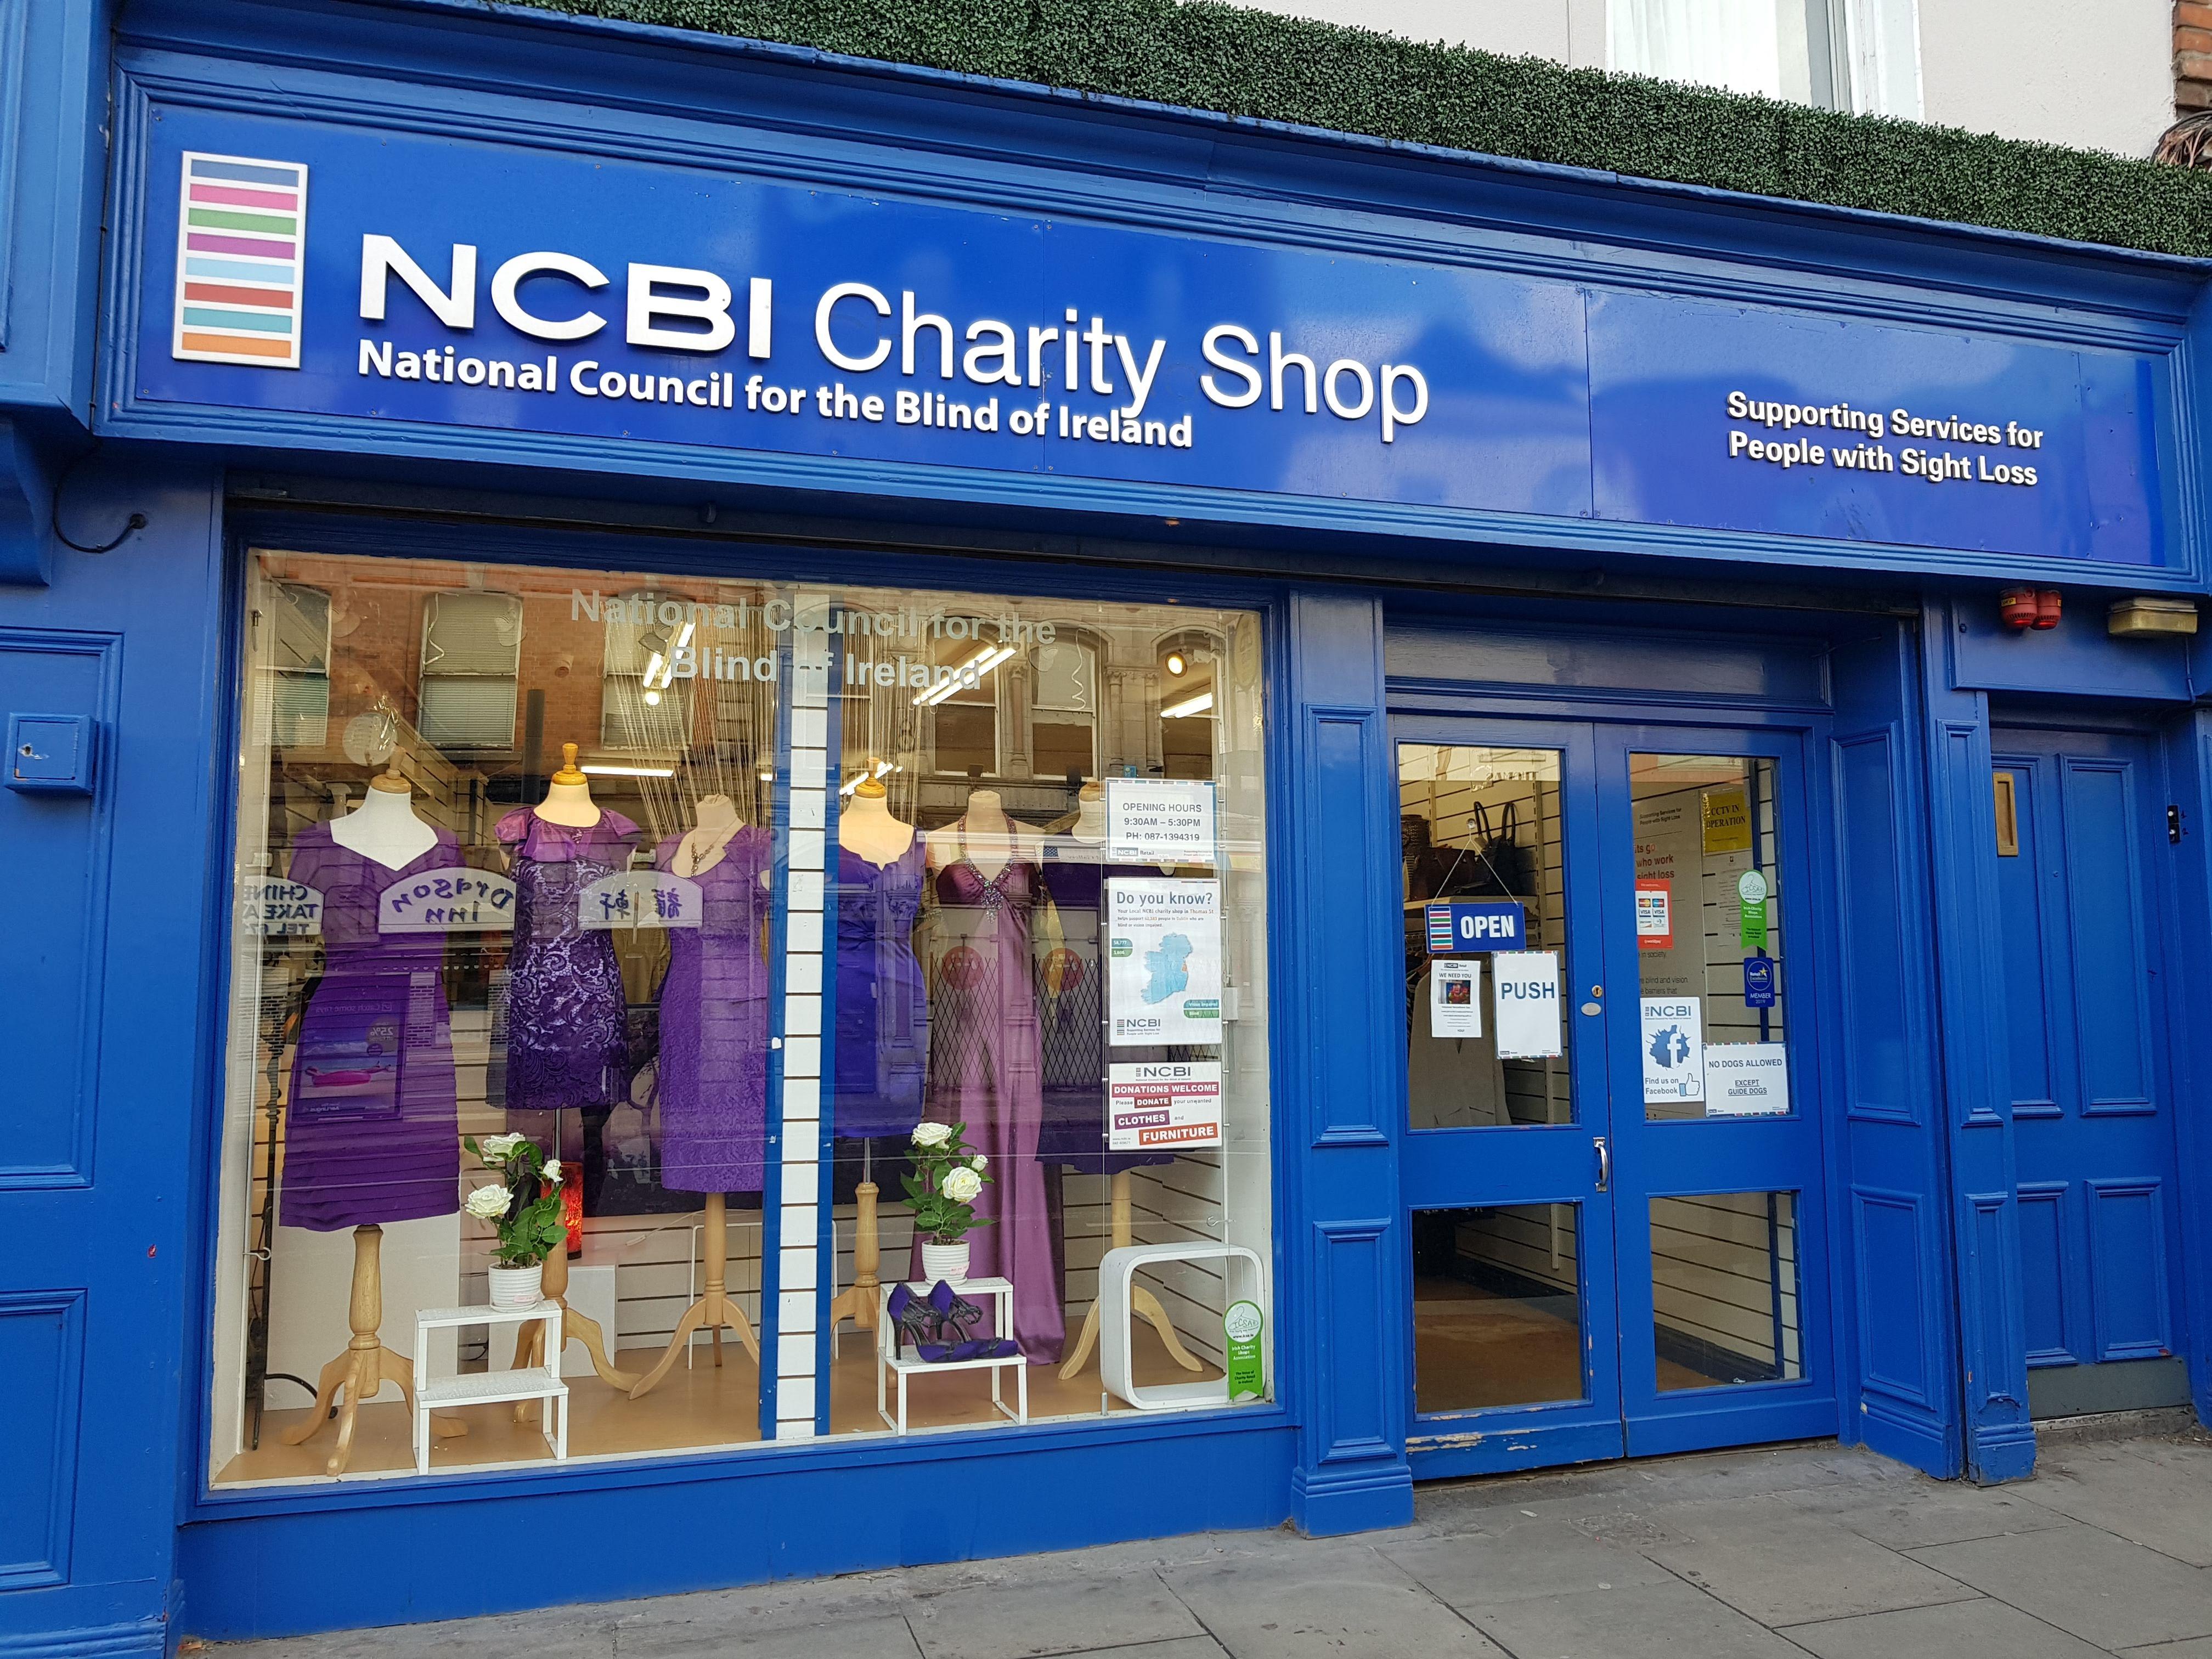 NCBI charity Shop